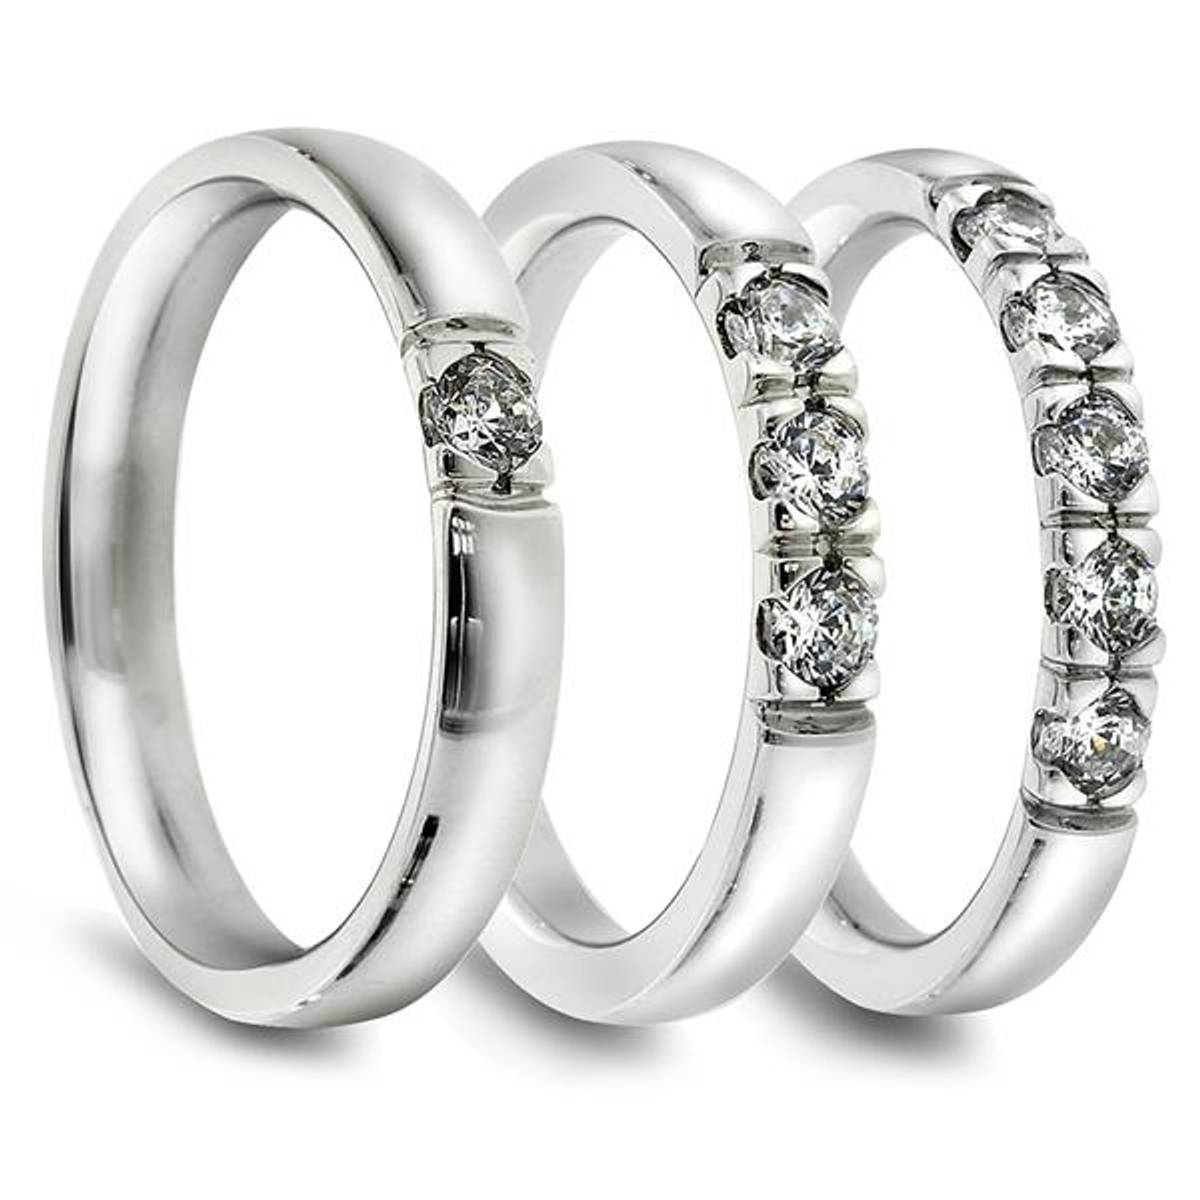 Lady Alliansering. 3 stk 0,03 ct diamanter.